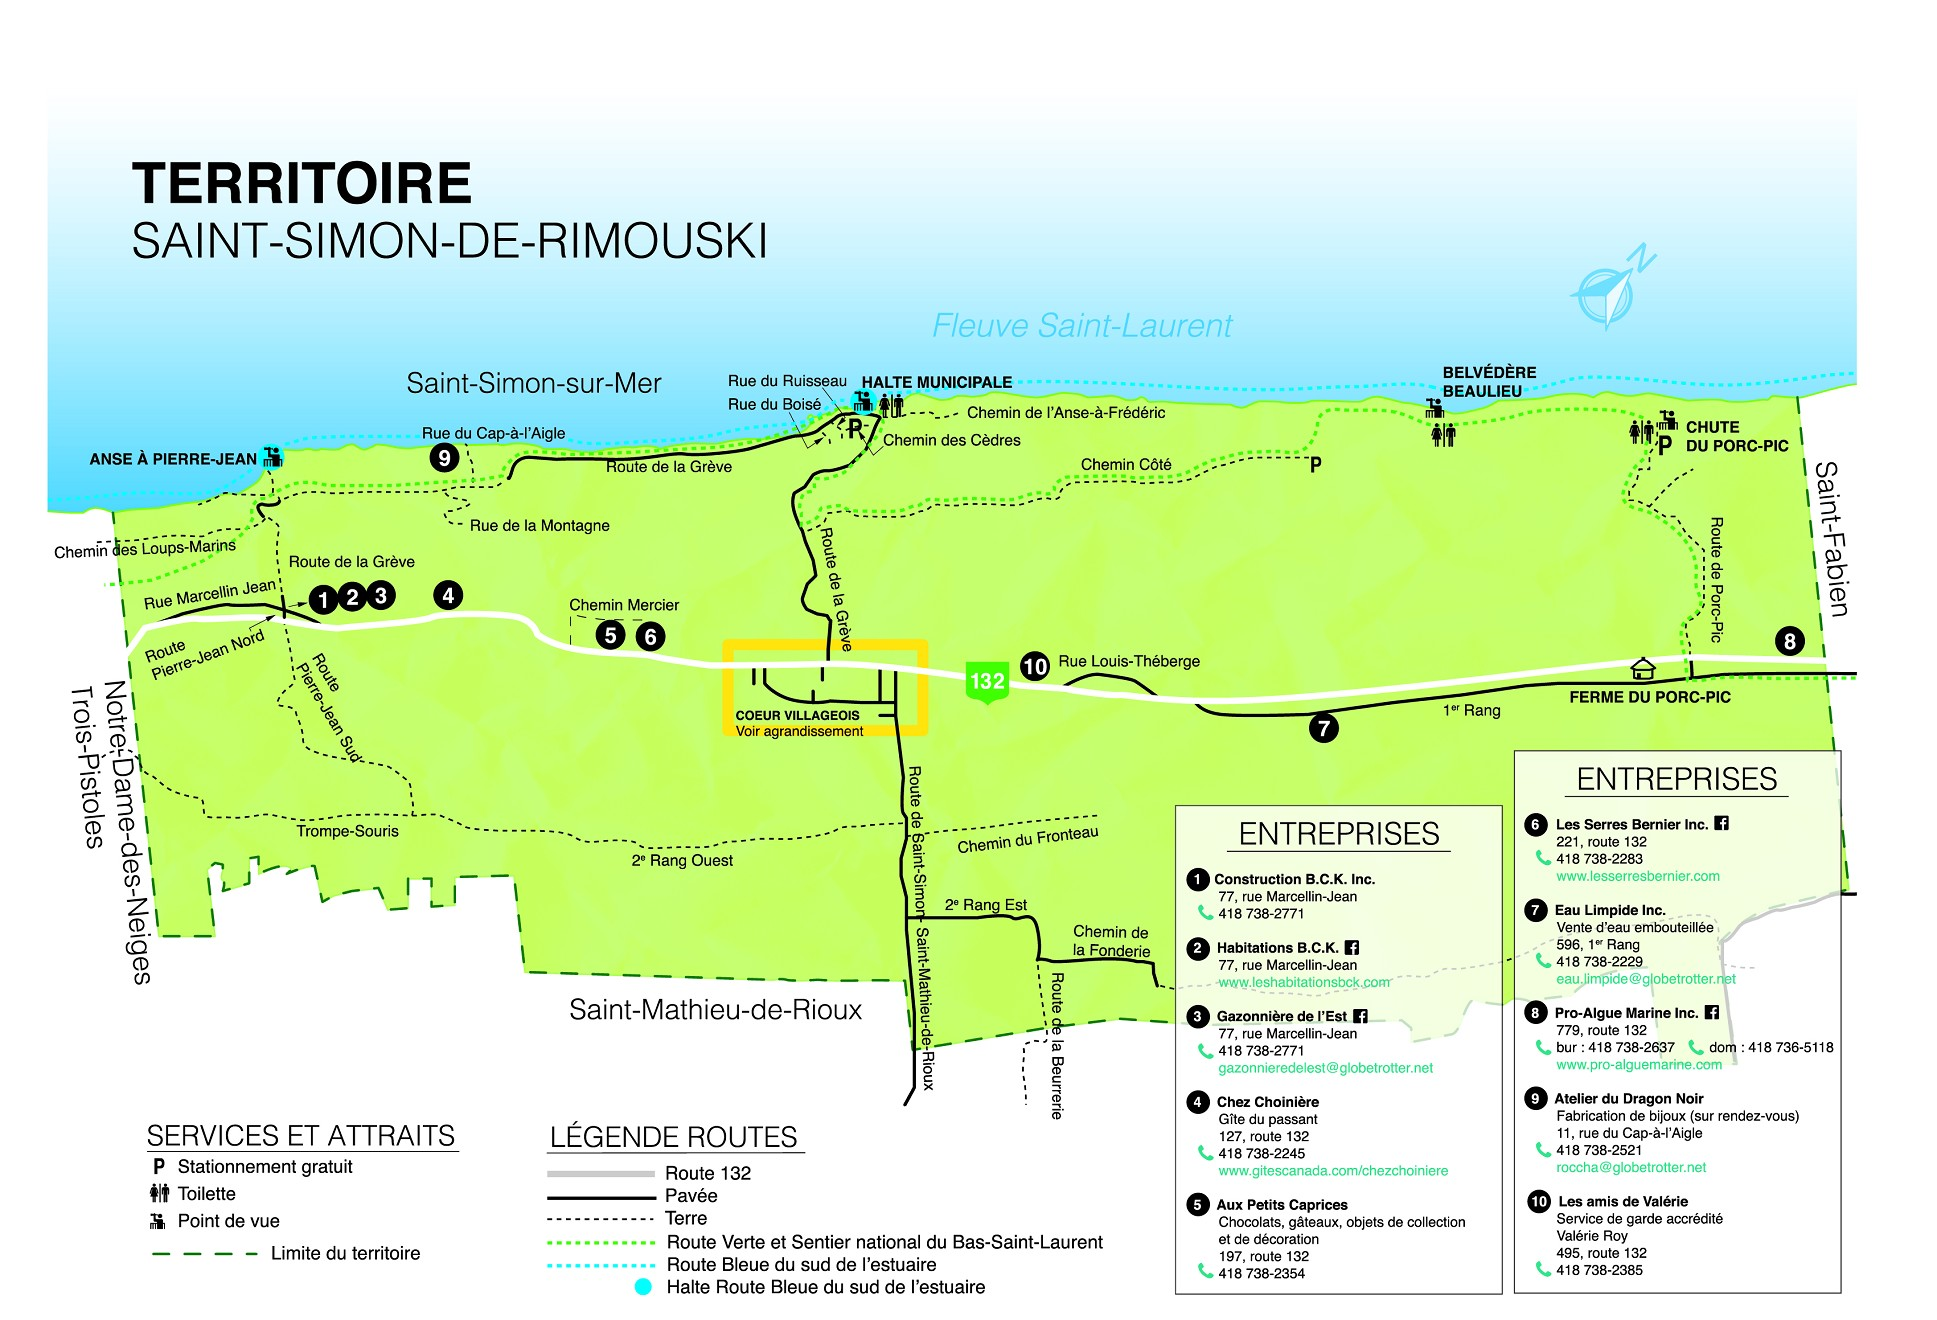 Carte du territoire Saint-Simon-de-Rimouski